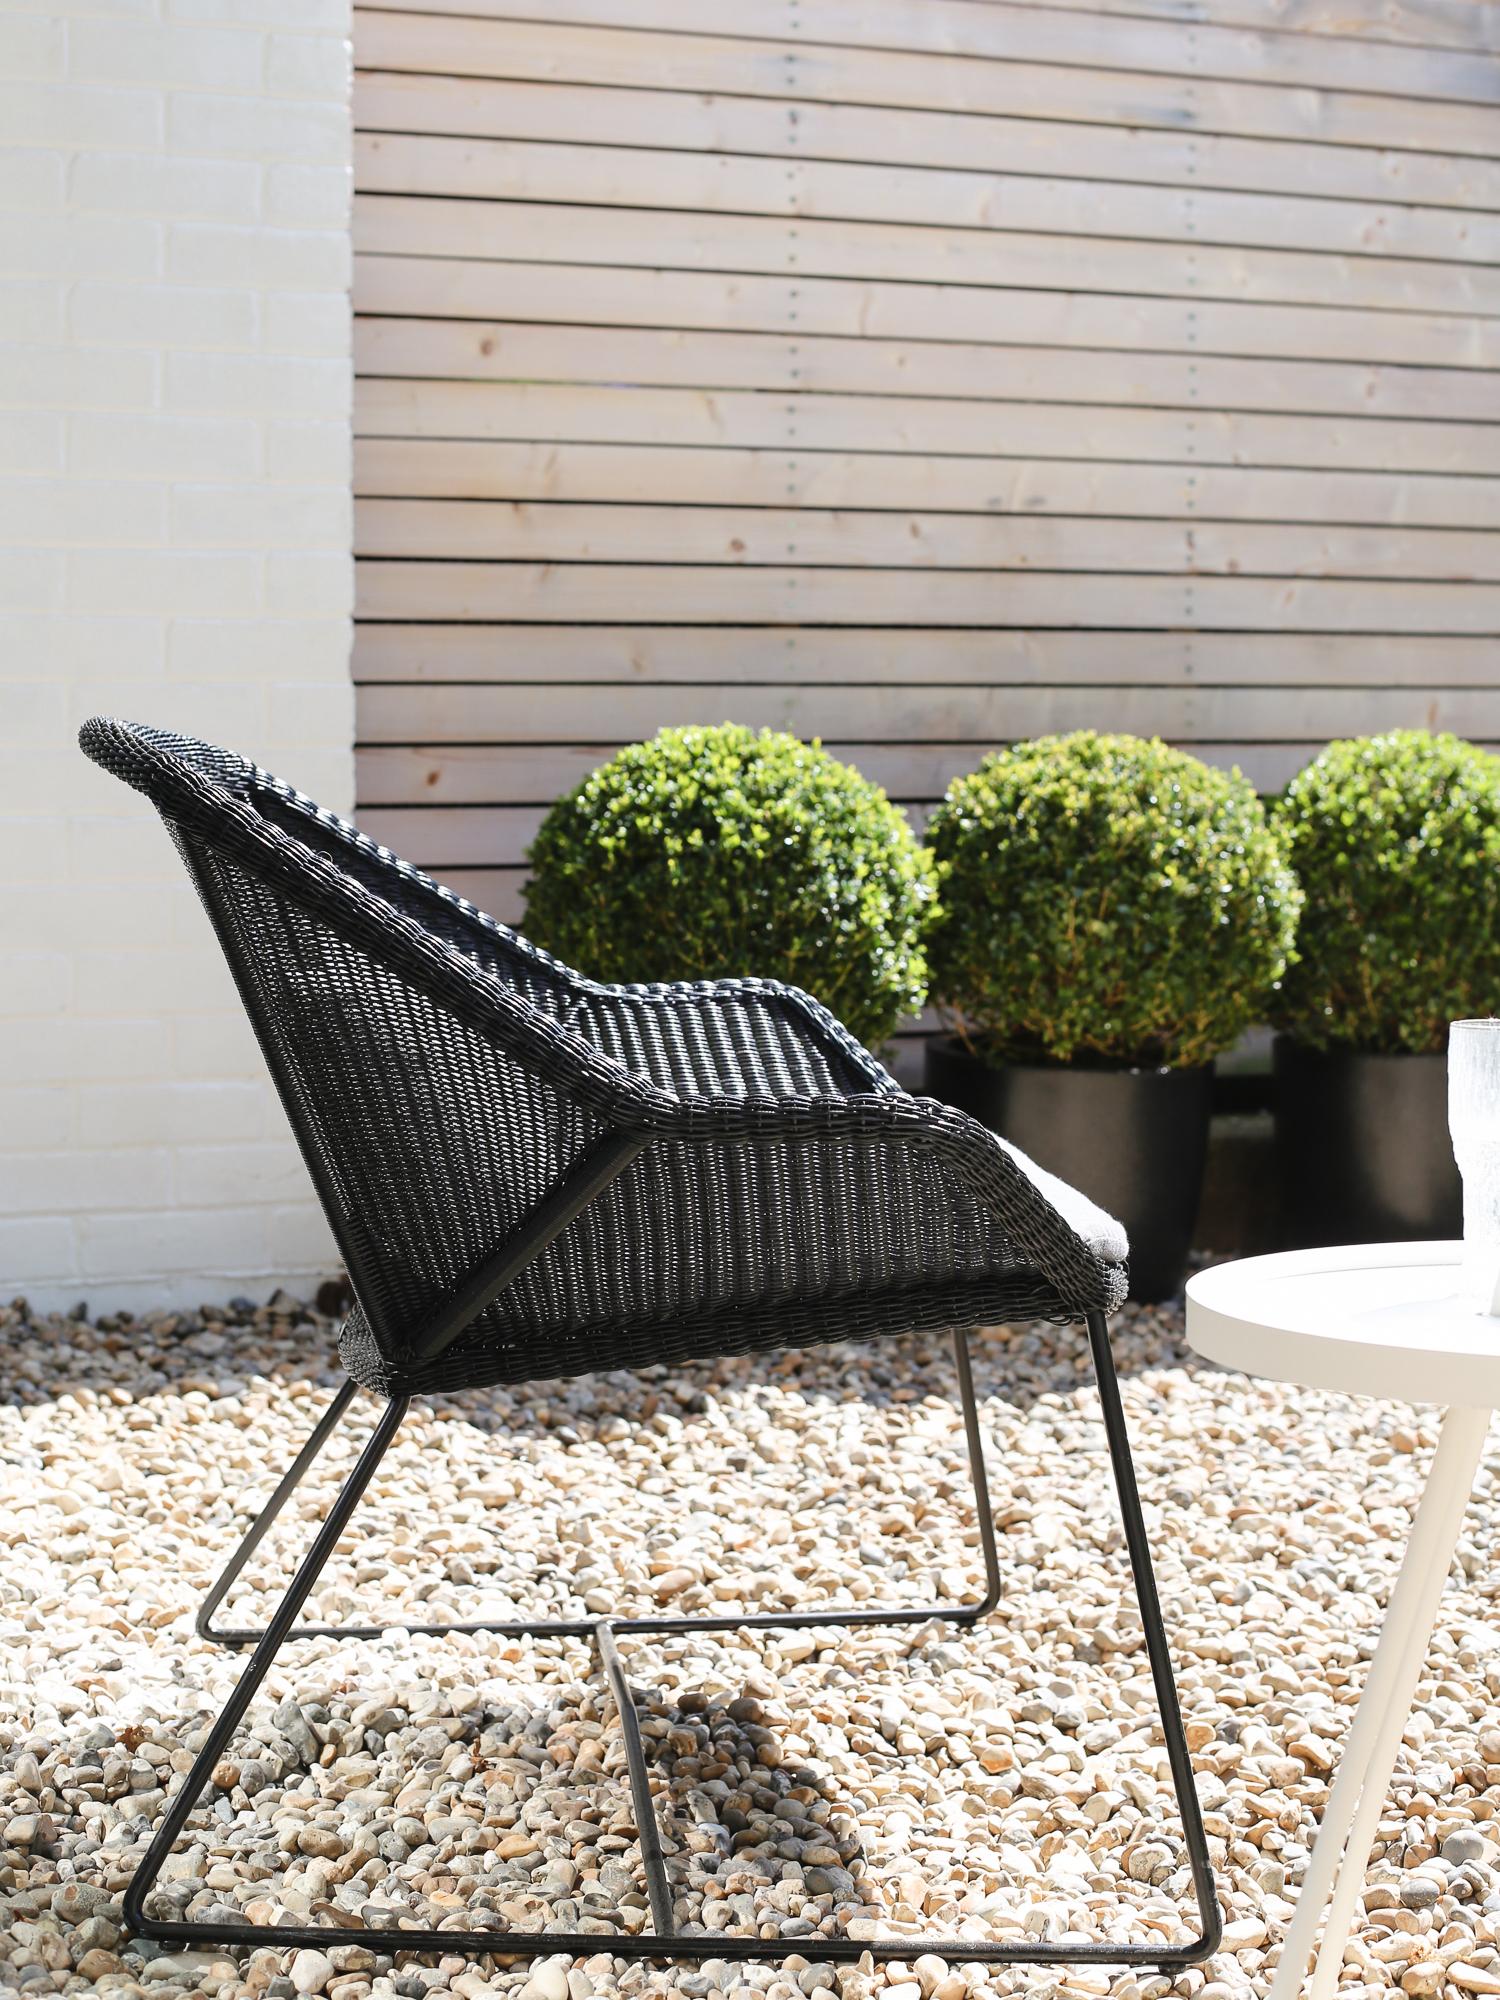 Black rattan chair by Cane-line | Design Hunter